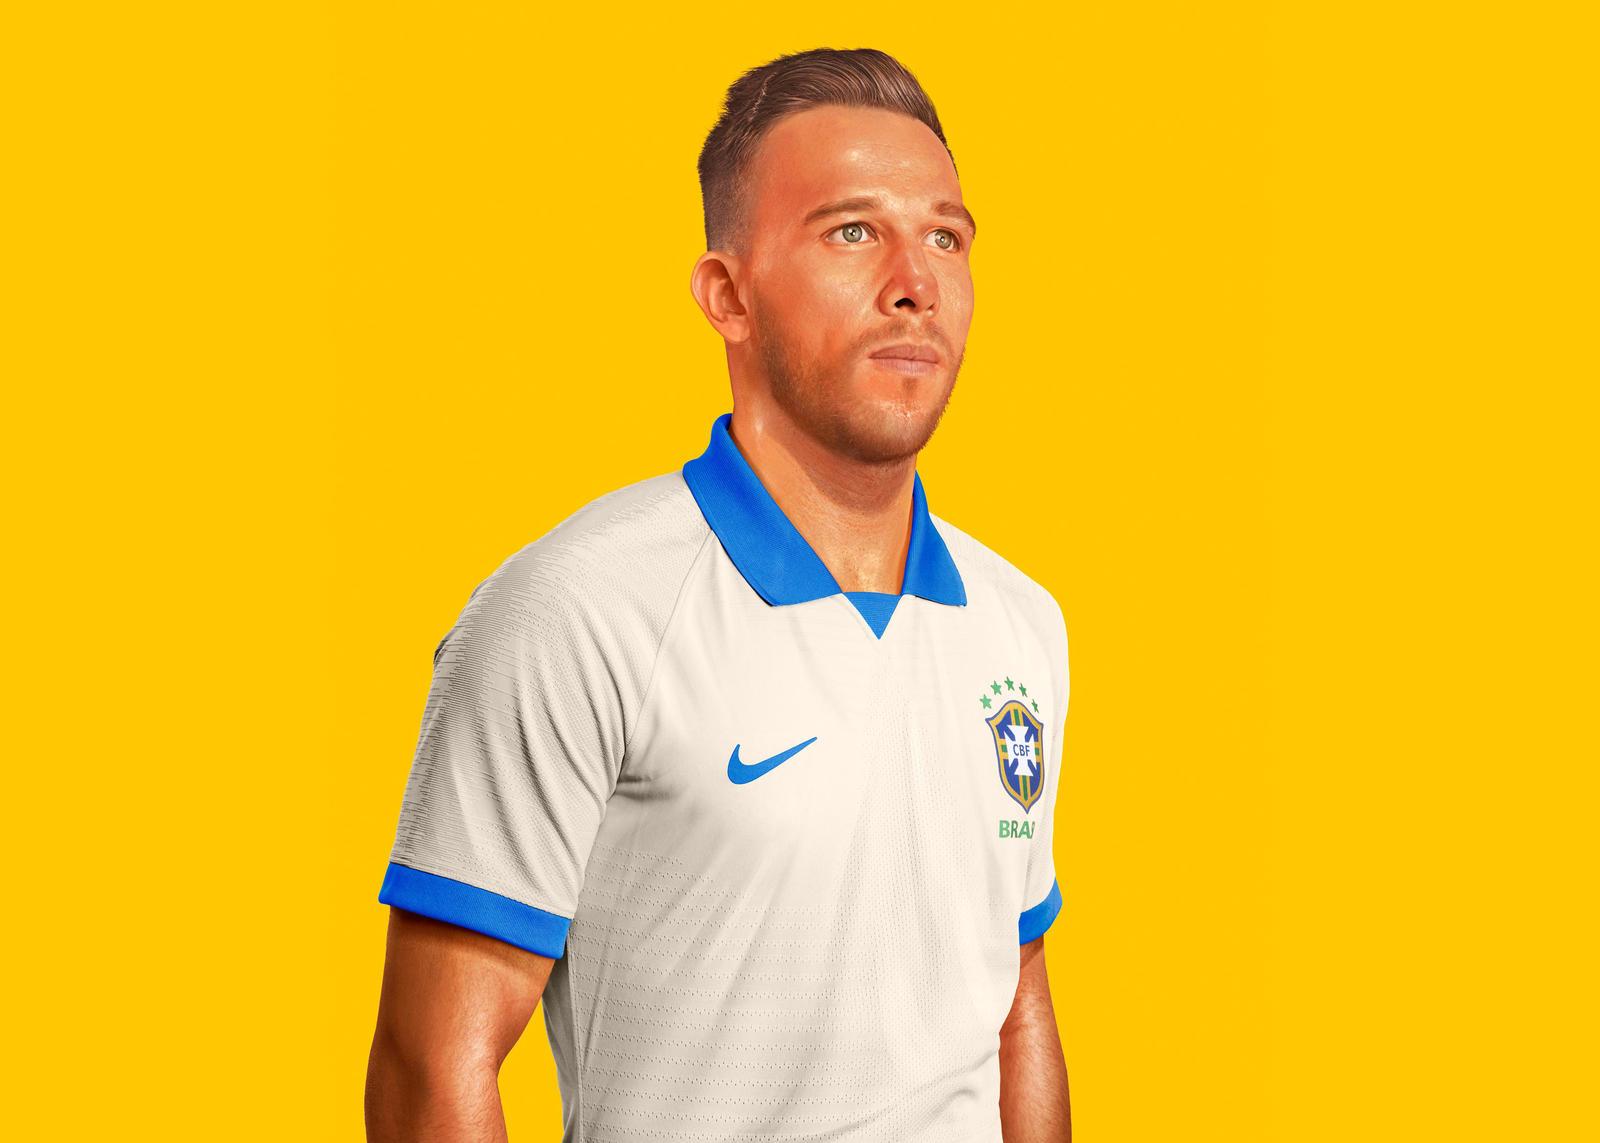 Brazilië Uitshirt 2019 2021 Voetbalshirts Com